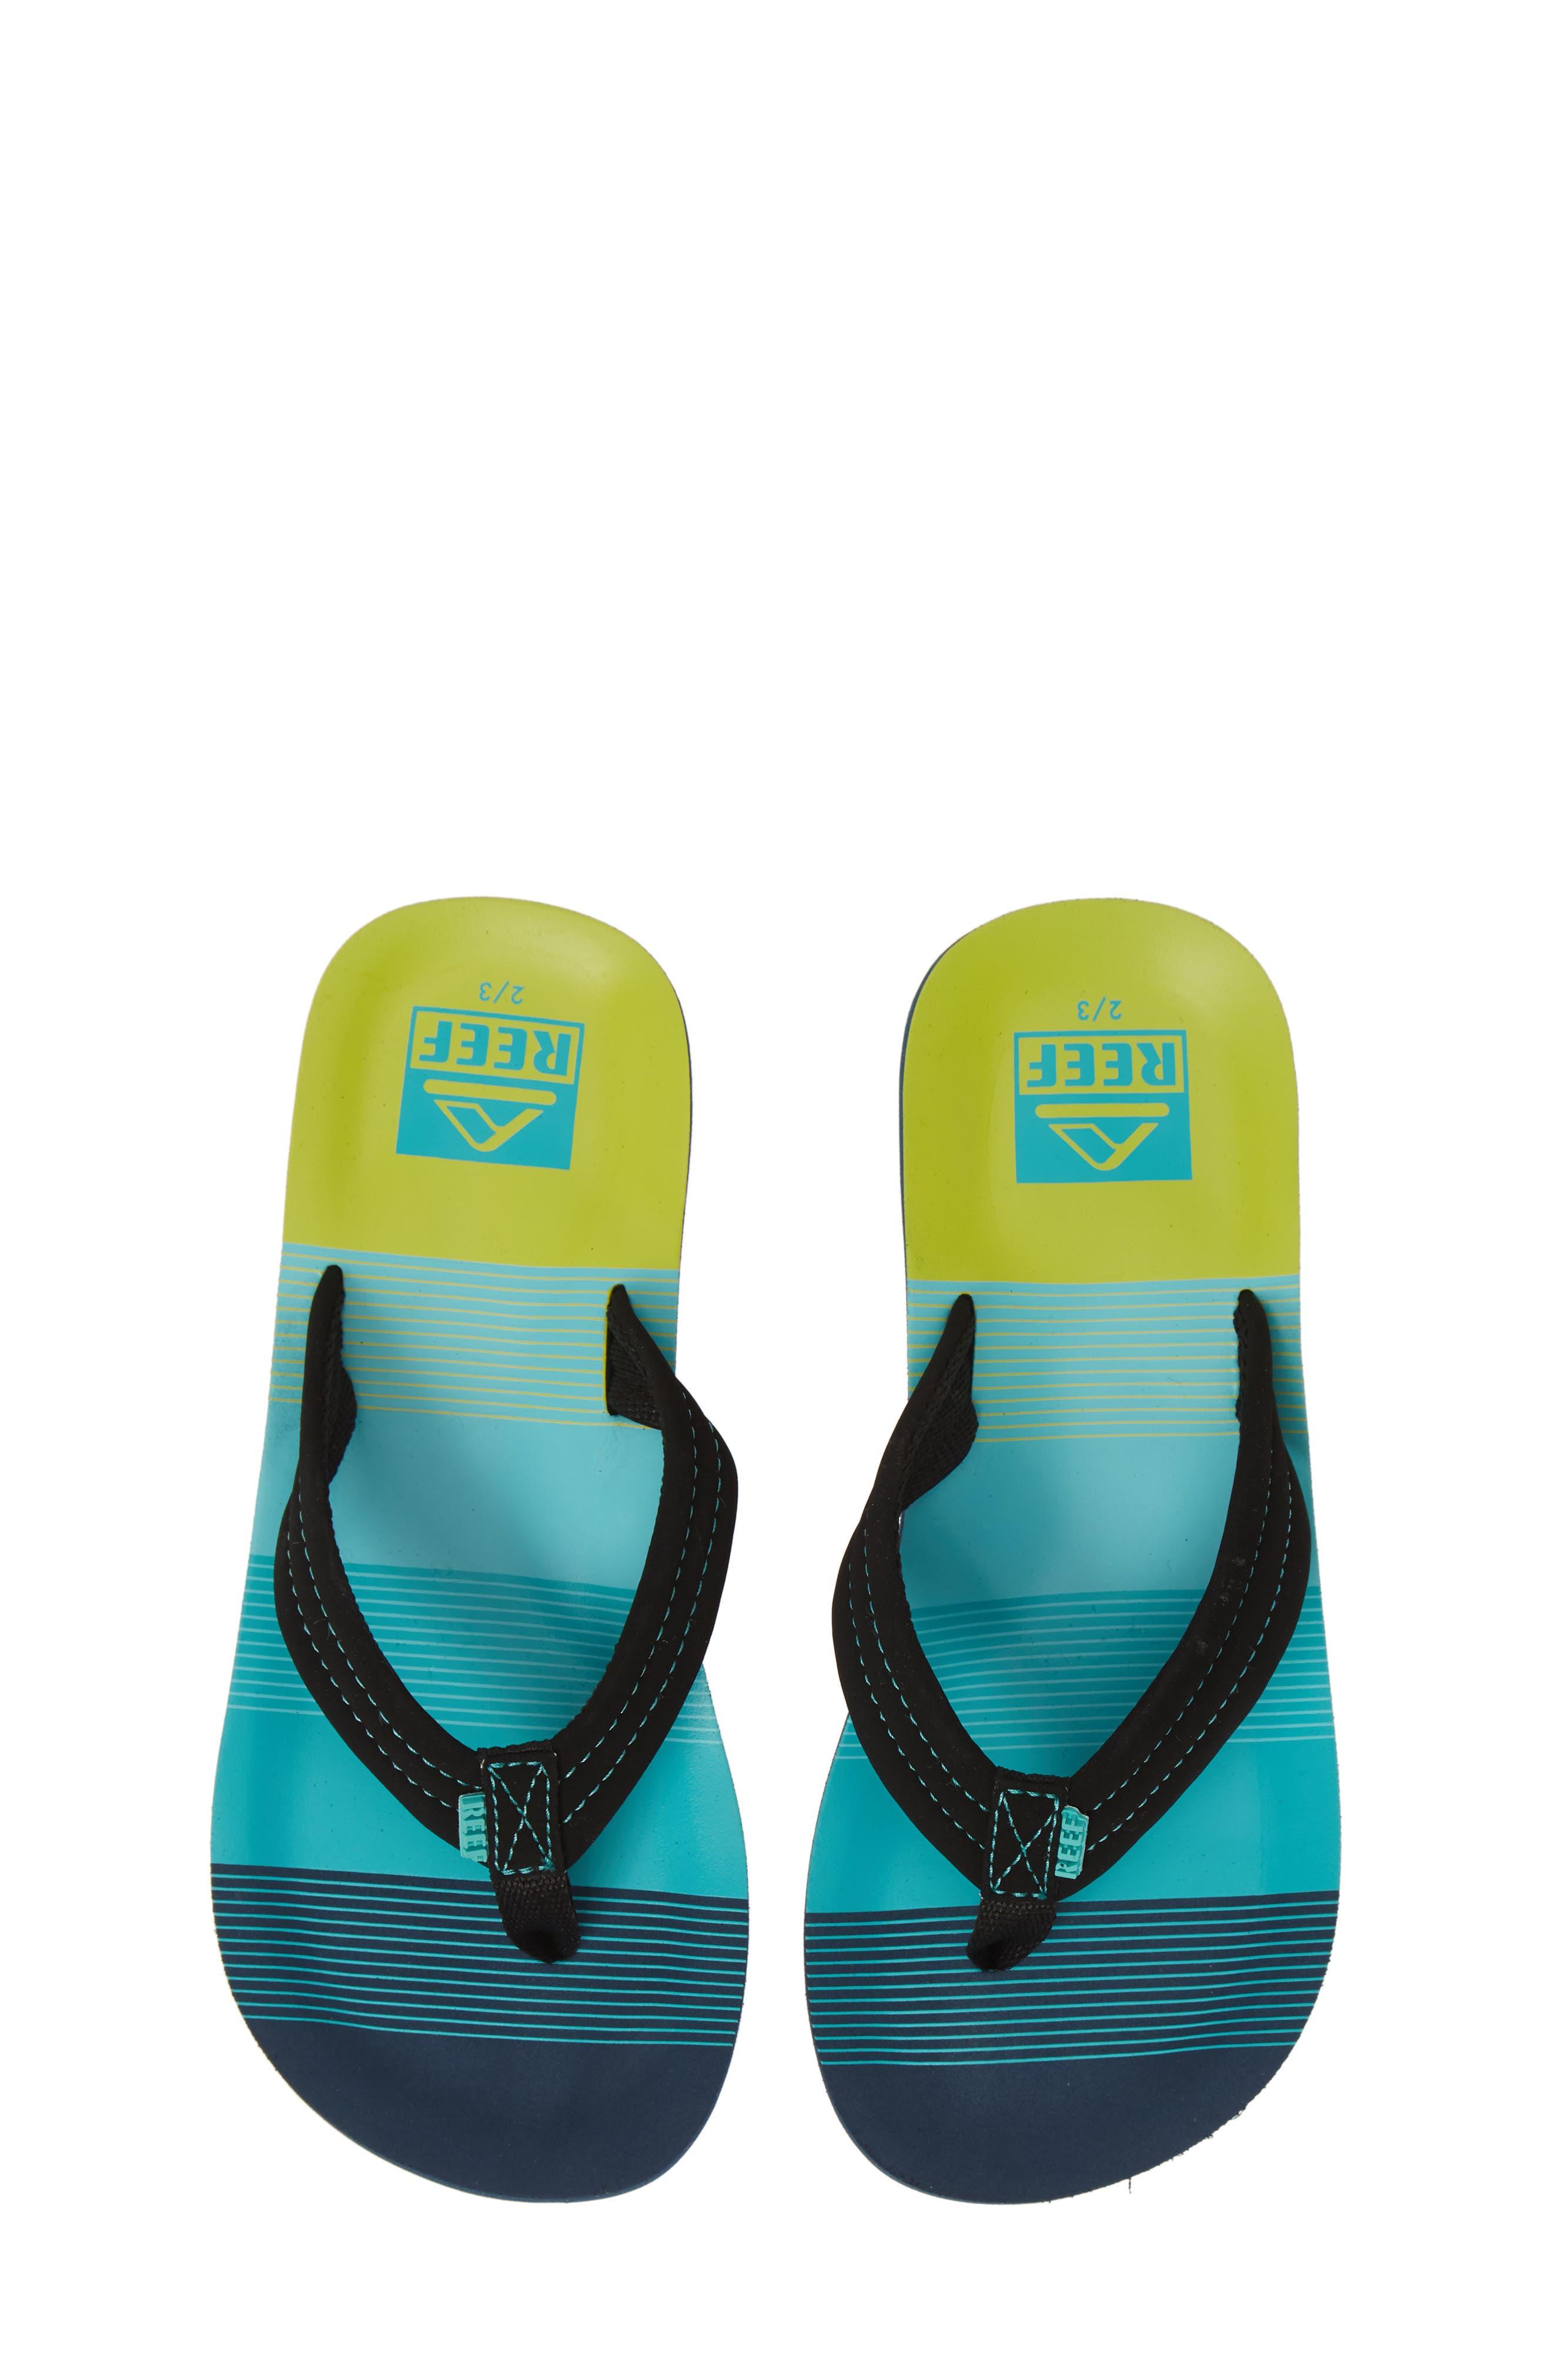 1cc954ca7150 Blue Reef Sandals   Flip-Flops